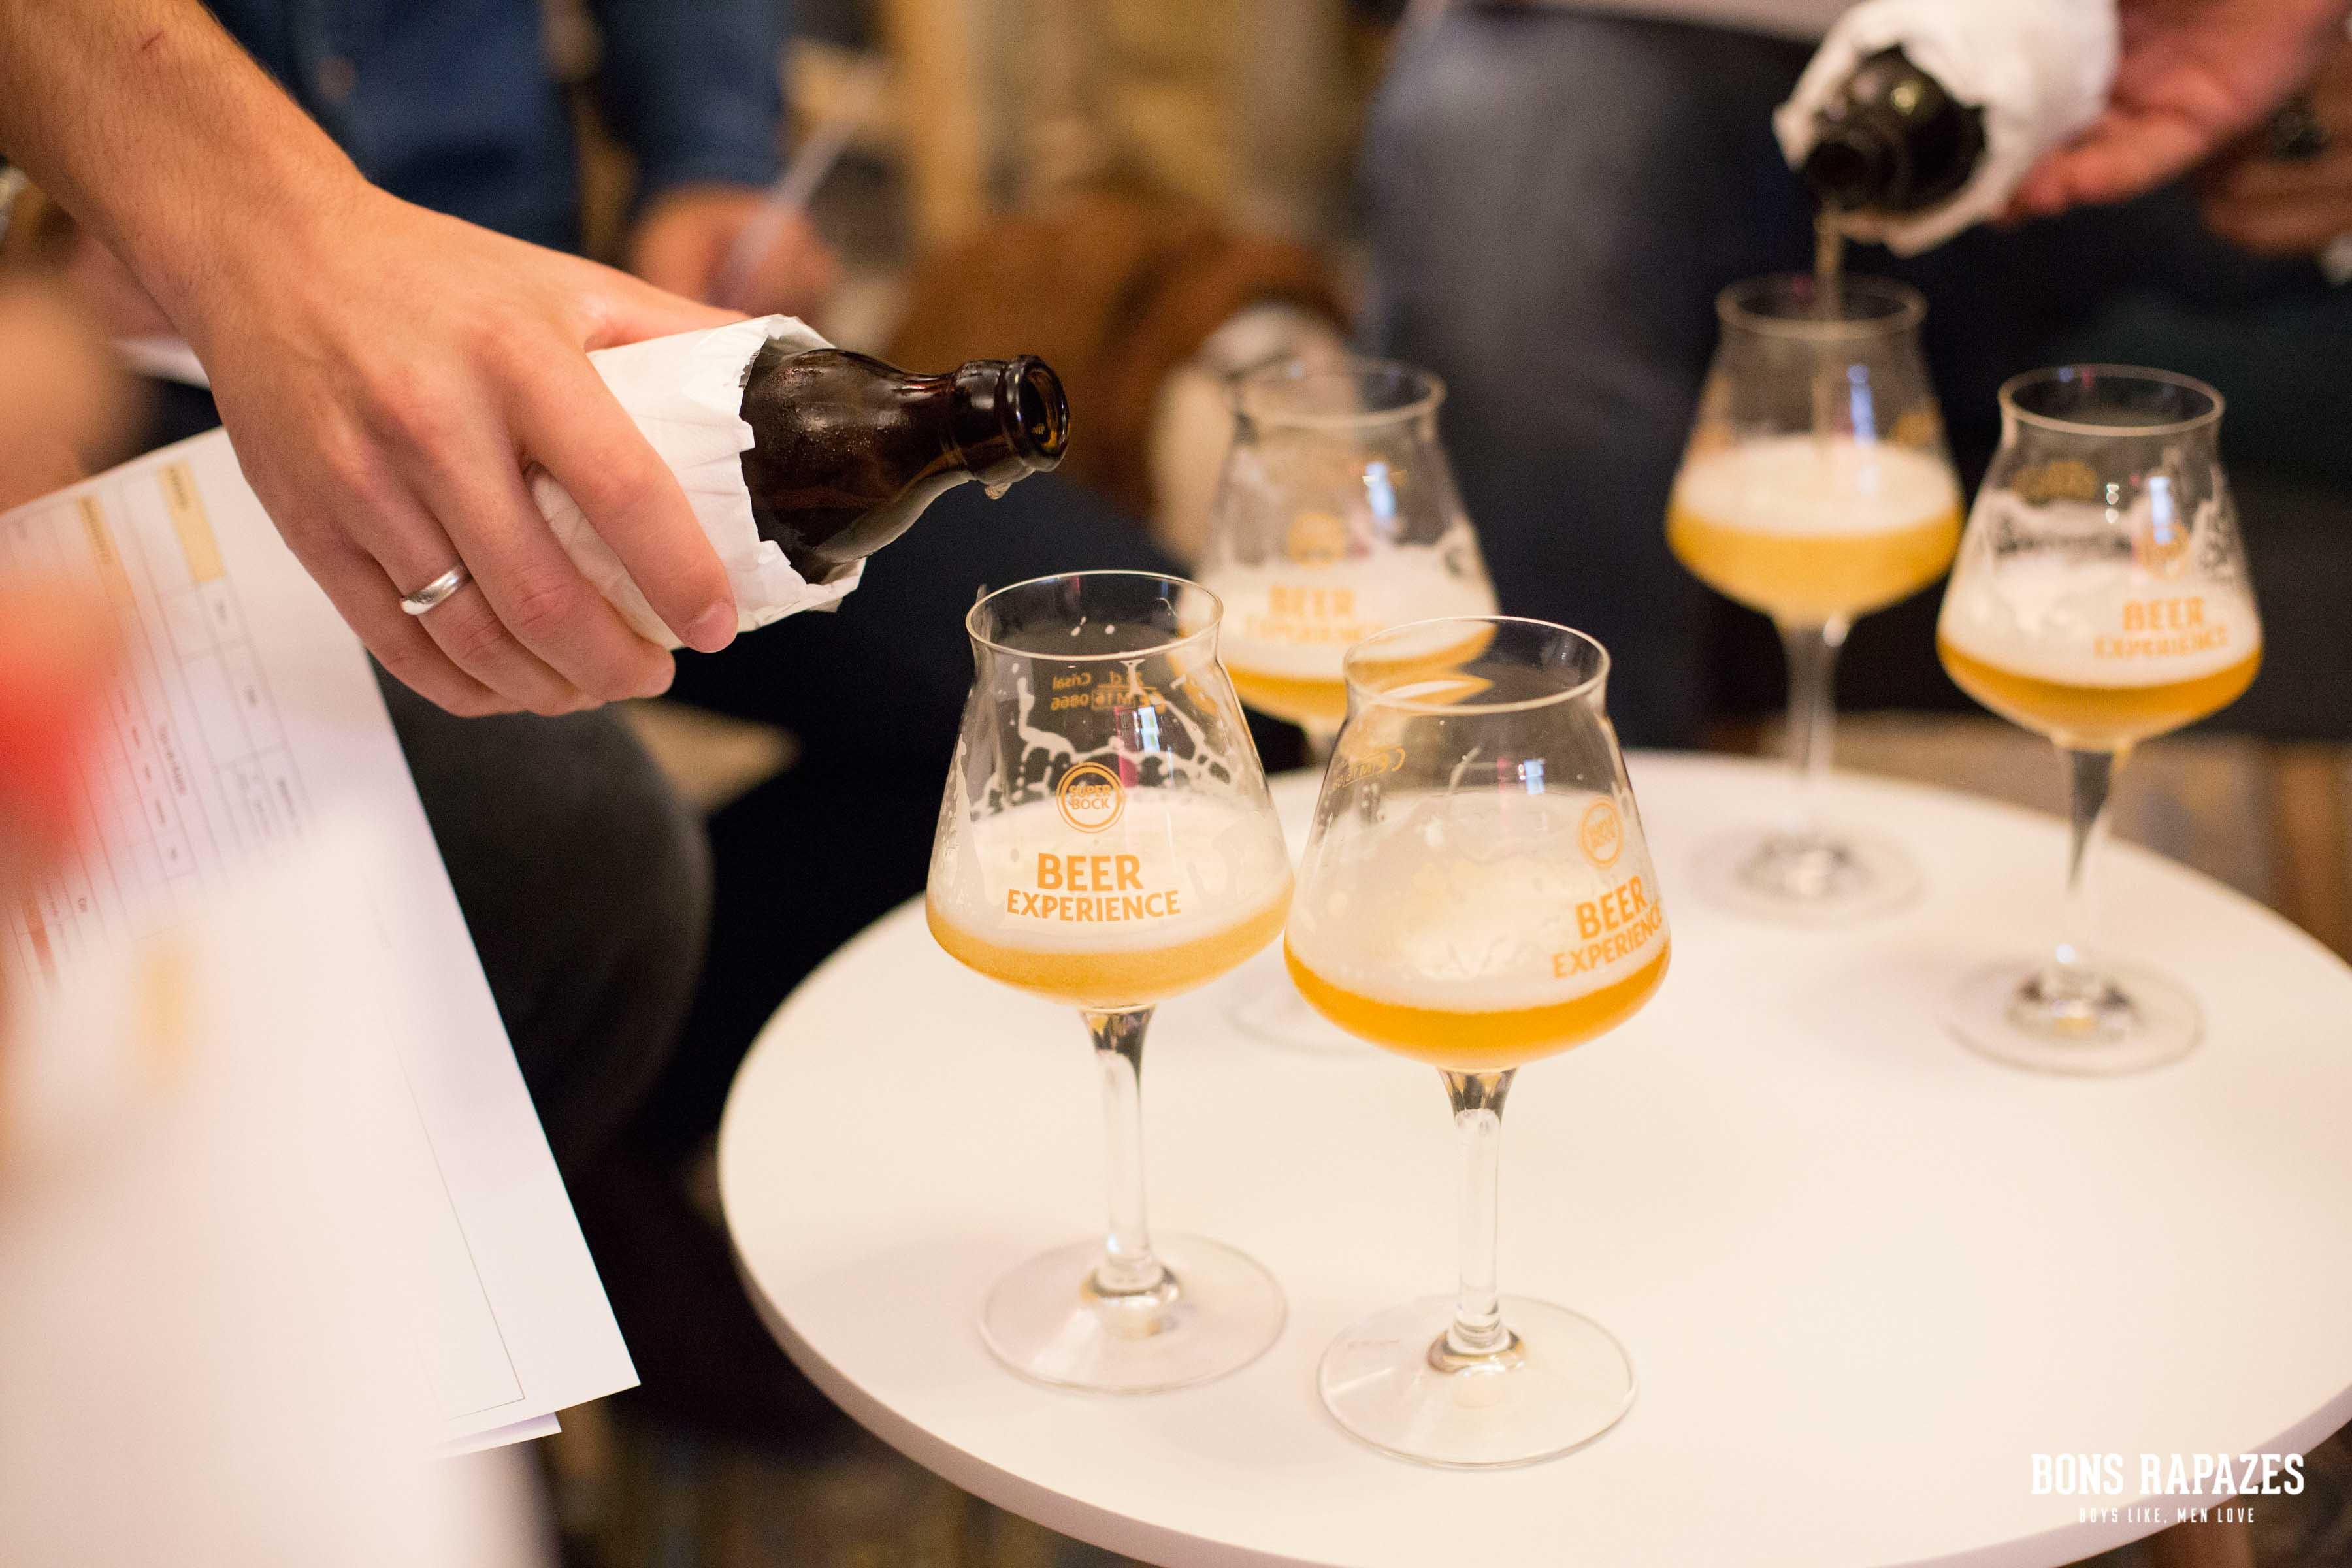 bons-rapazes-super-bock-beer-experience-21